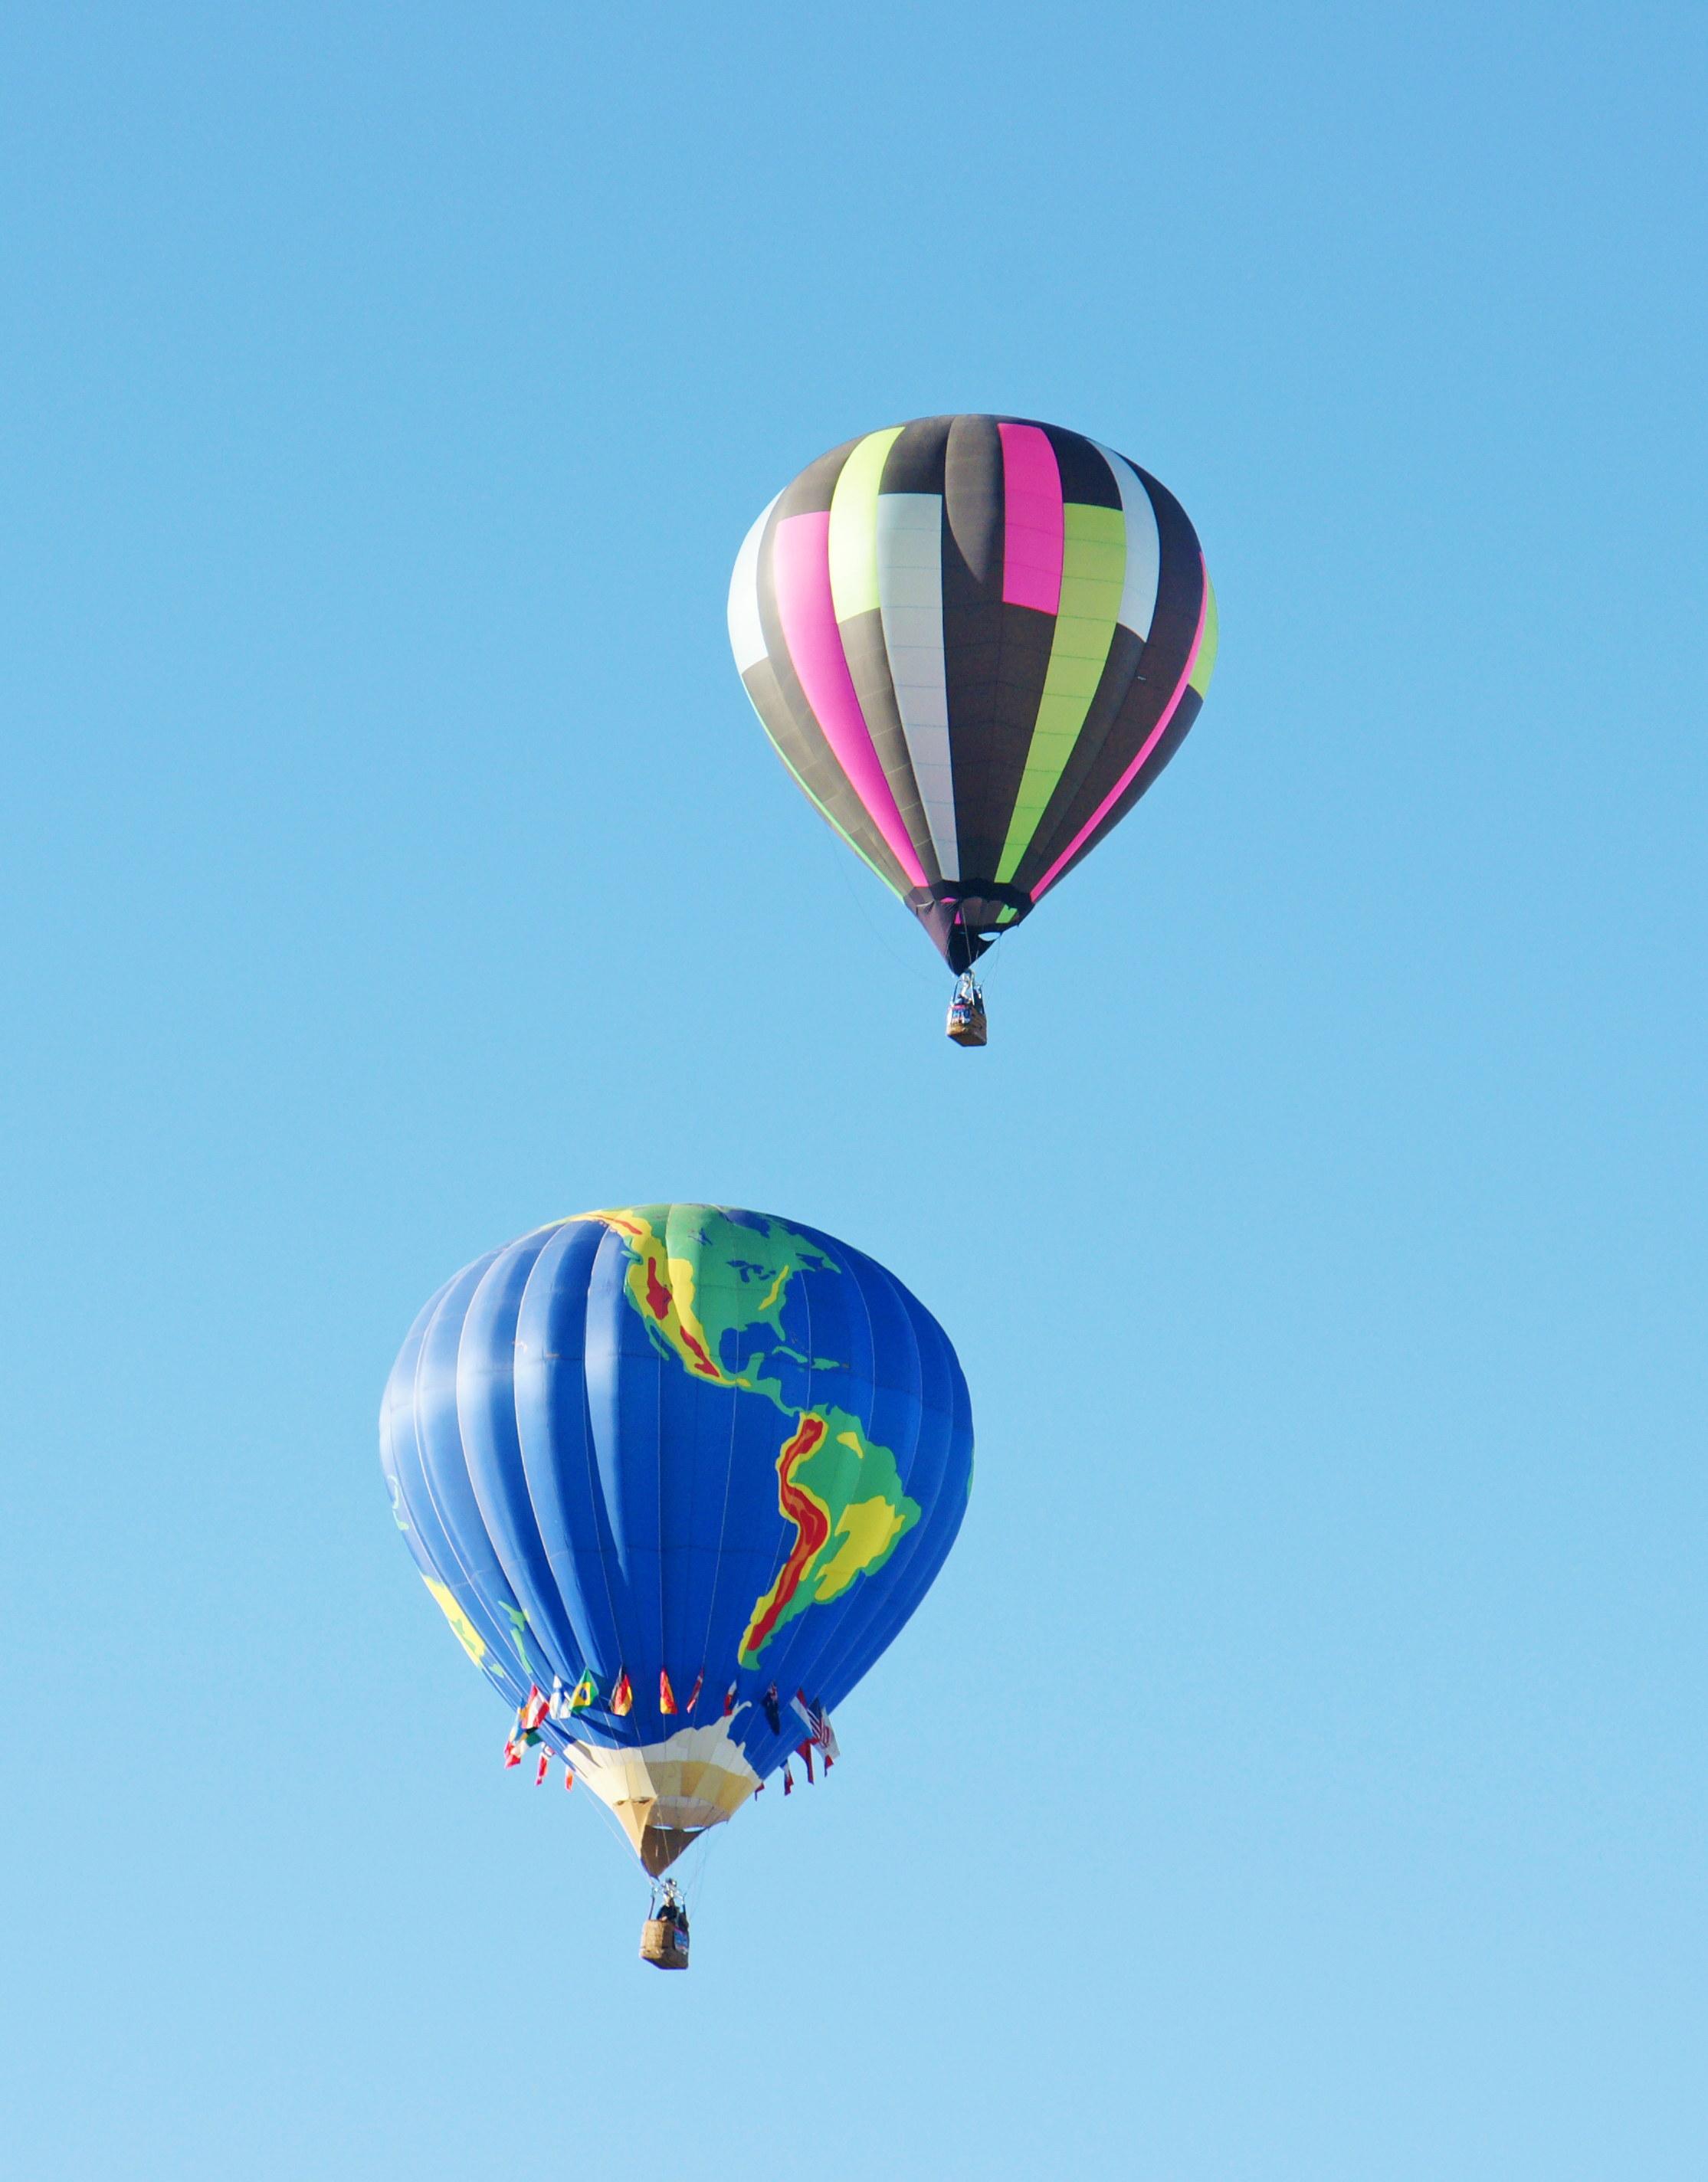 aibf-Single-Balloons-Gallery21